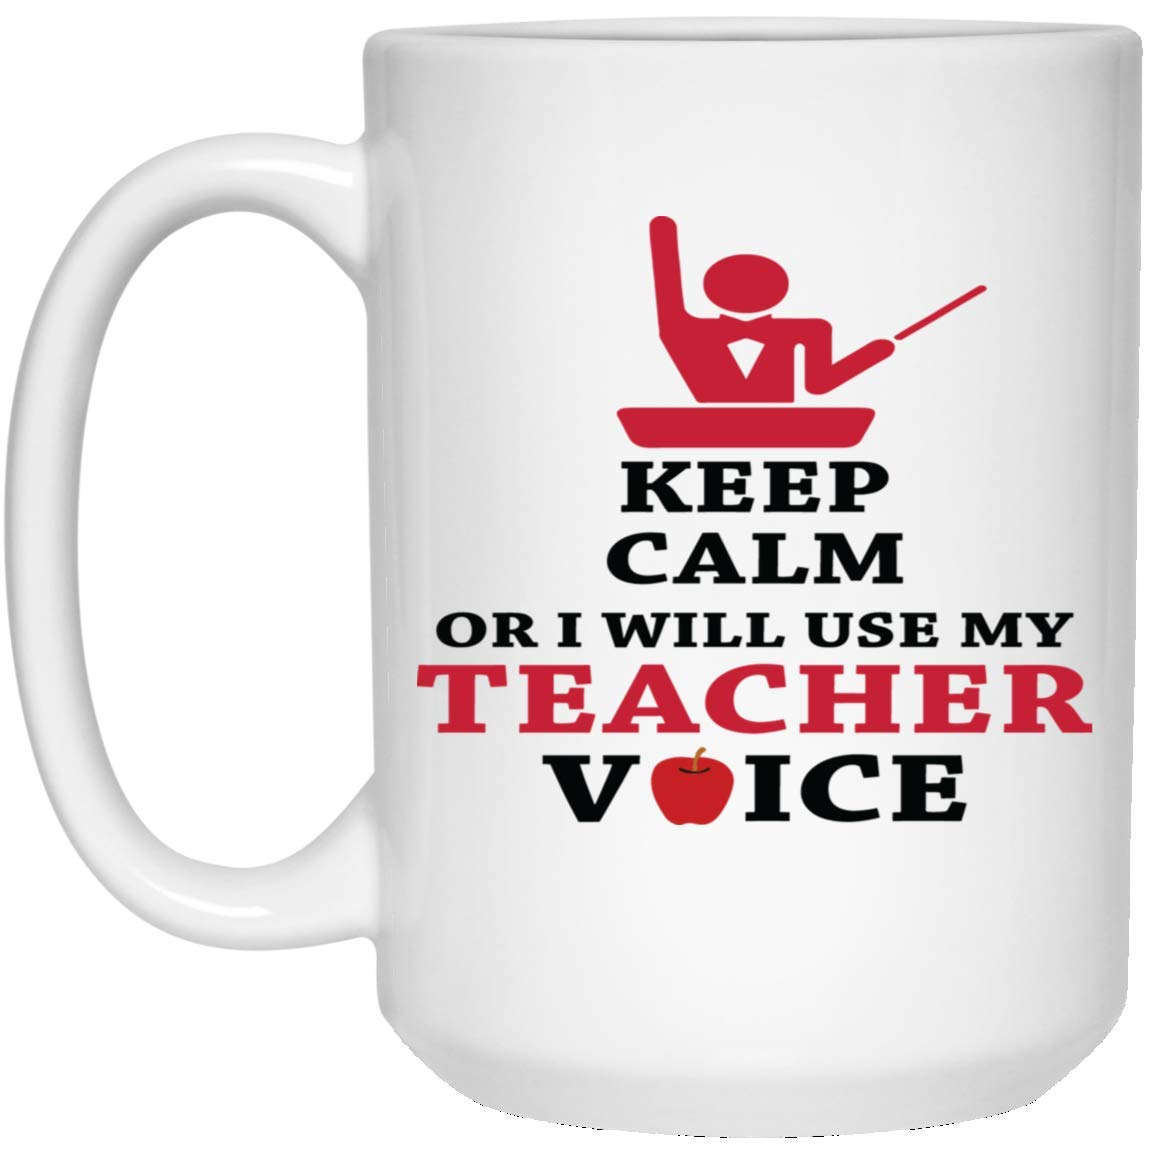 e79ccaa870a Amazon.com: Kingdom Creations Keep Calm or I Will use My Teacher Voice  Coffee Mug Cup, 15 oz, White: Sports & Outdoors